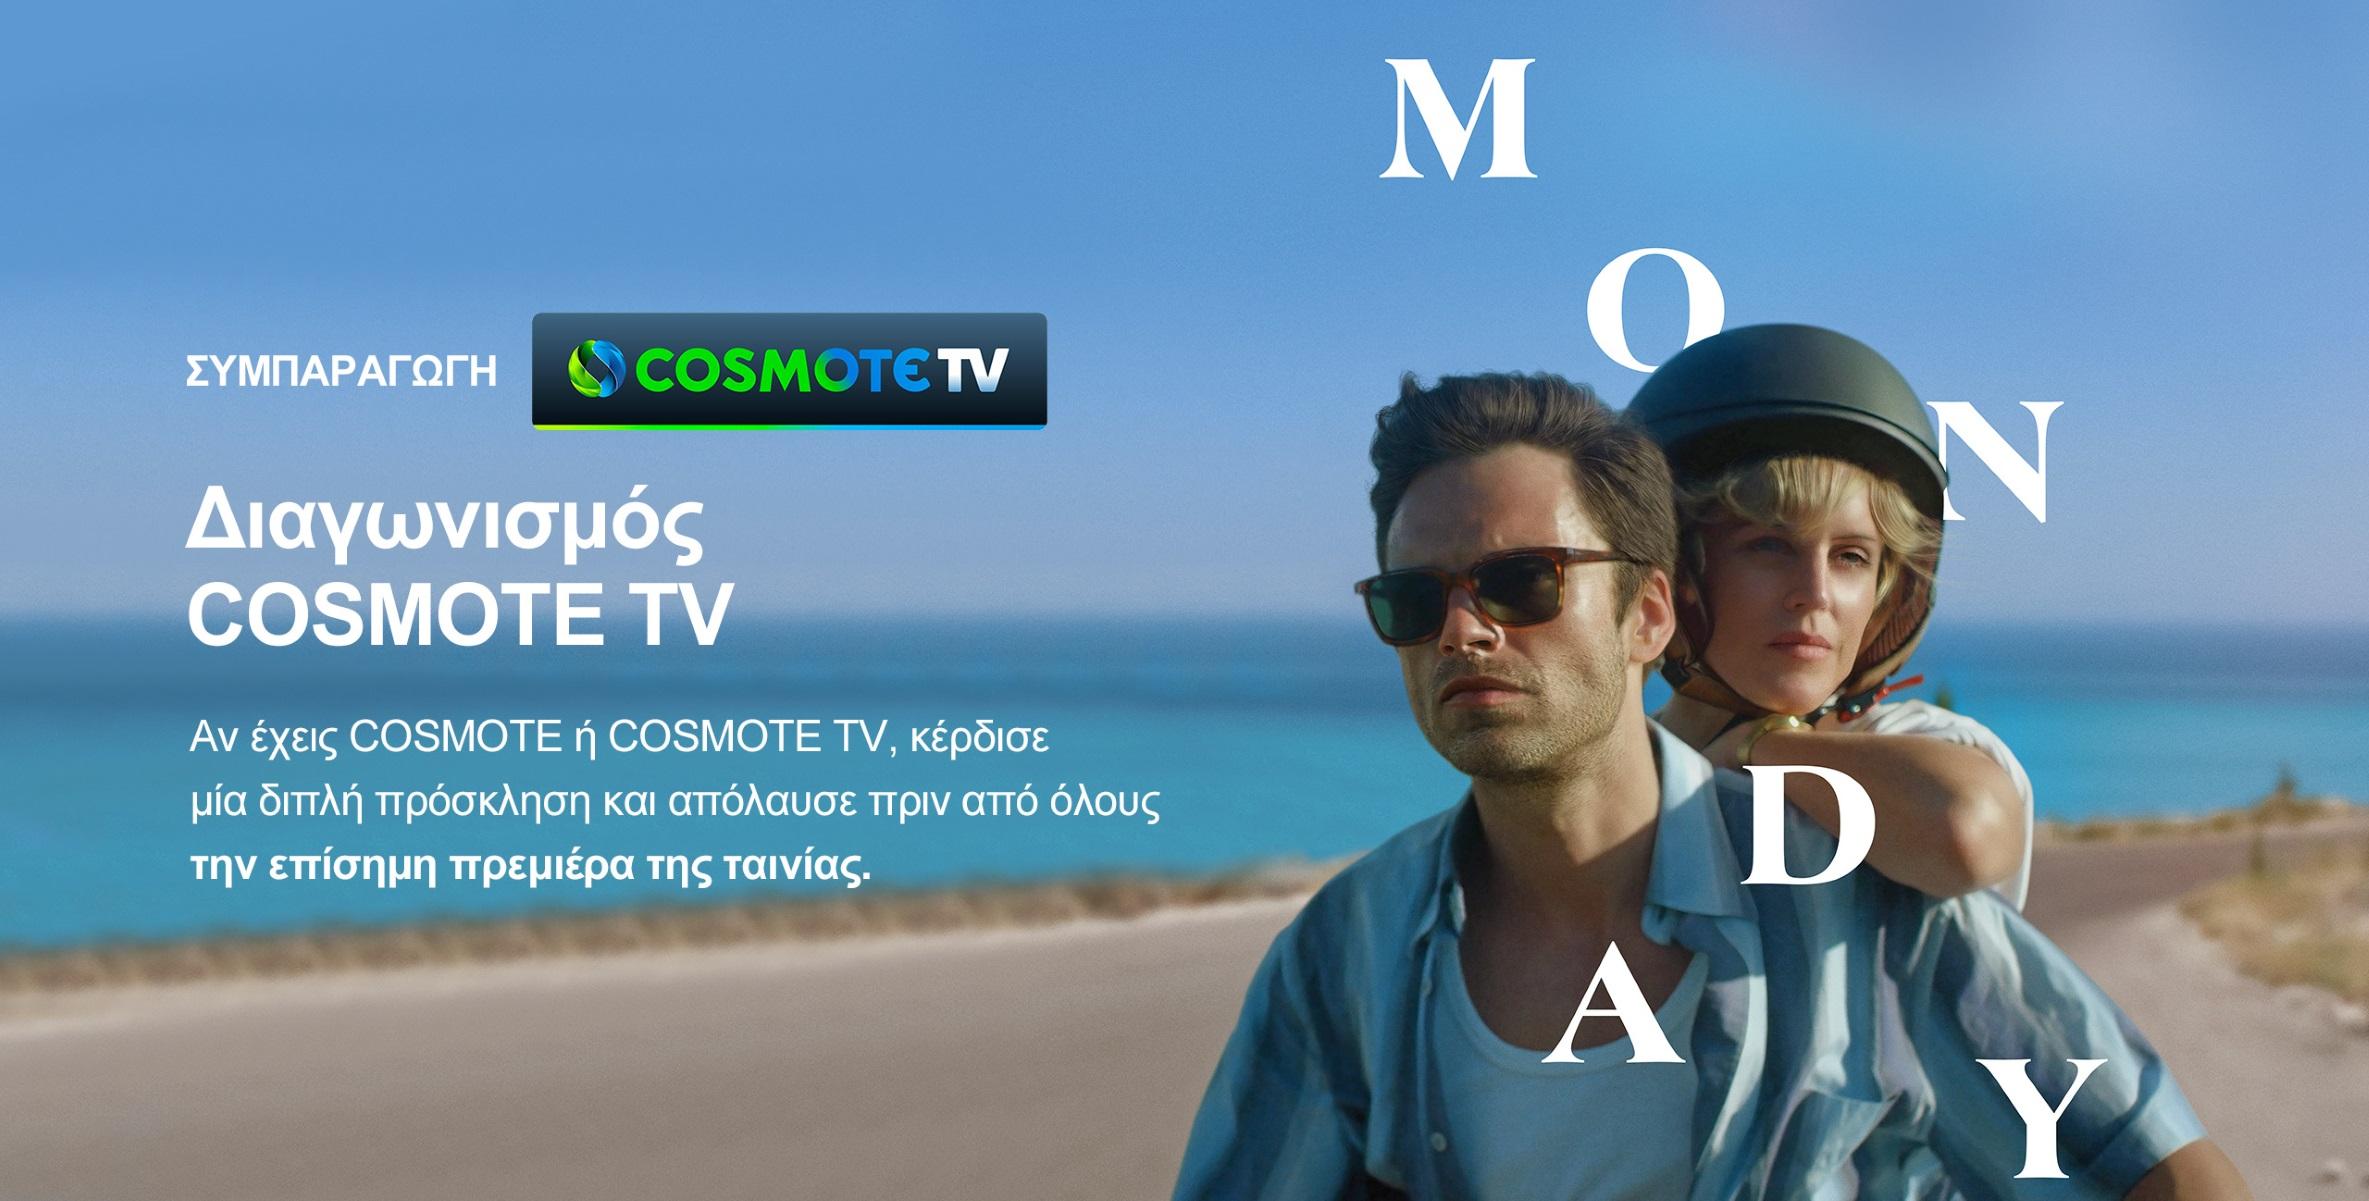 COSMOTE TV: Συμπαραγωγός της ταινίας «Monday» του Αργύρη Παπαδημητρόπουλου (pics, vid)